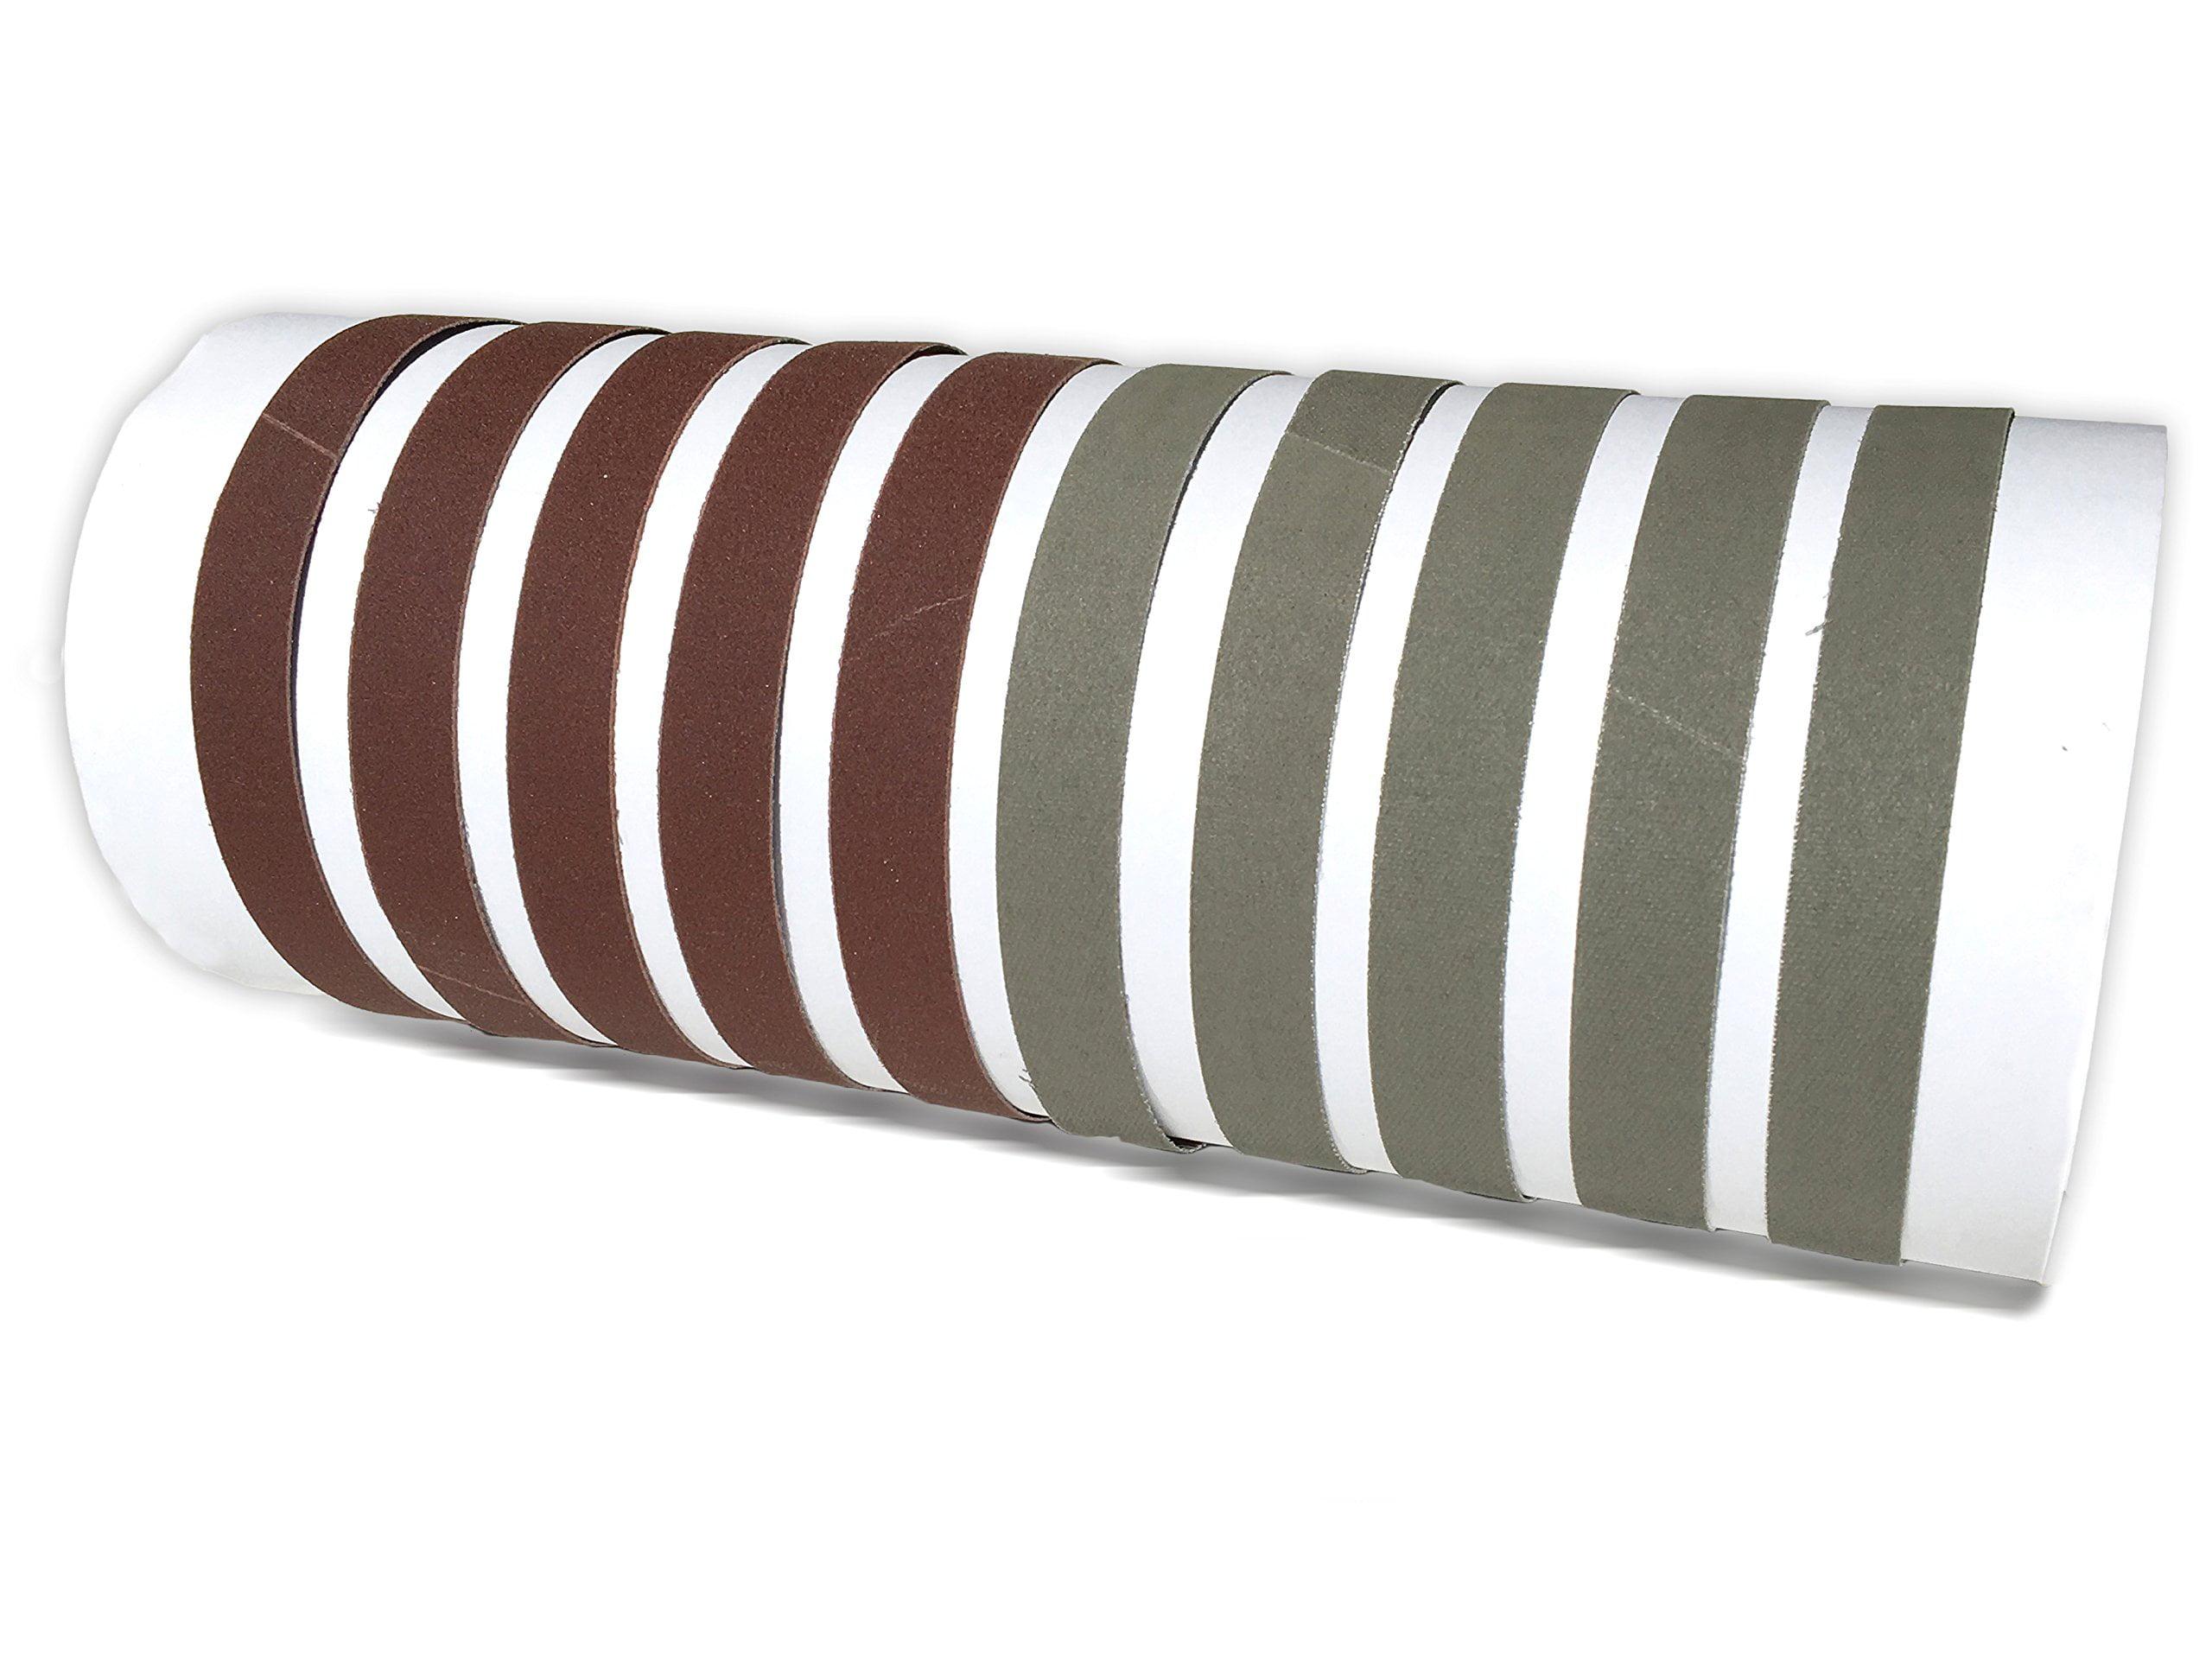 1 X 18 Inch Knife Sharpener Sanding Belts, 10 Pack (Compatible with Work Sharp Ken Onion... by Red Label Abrasives